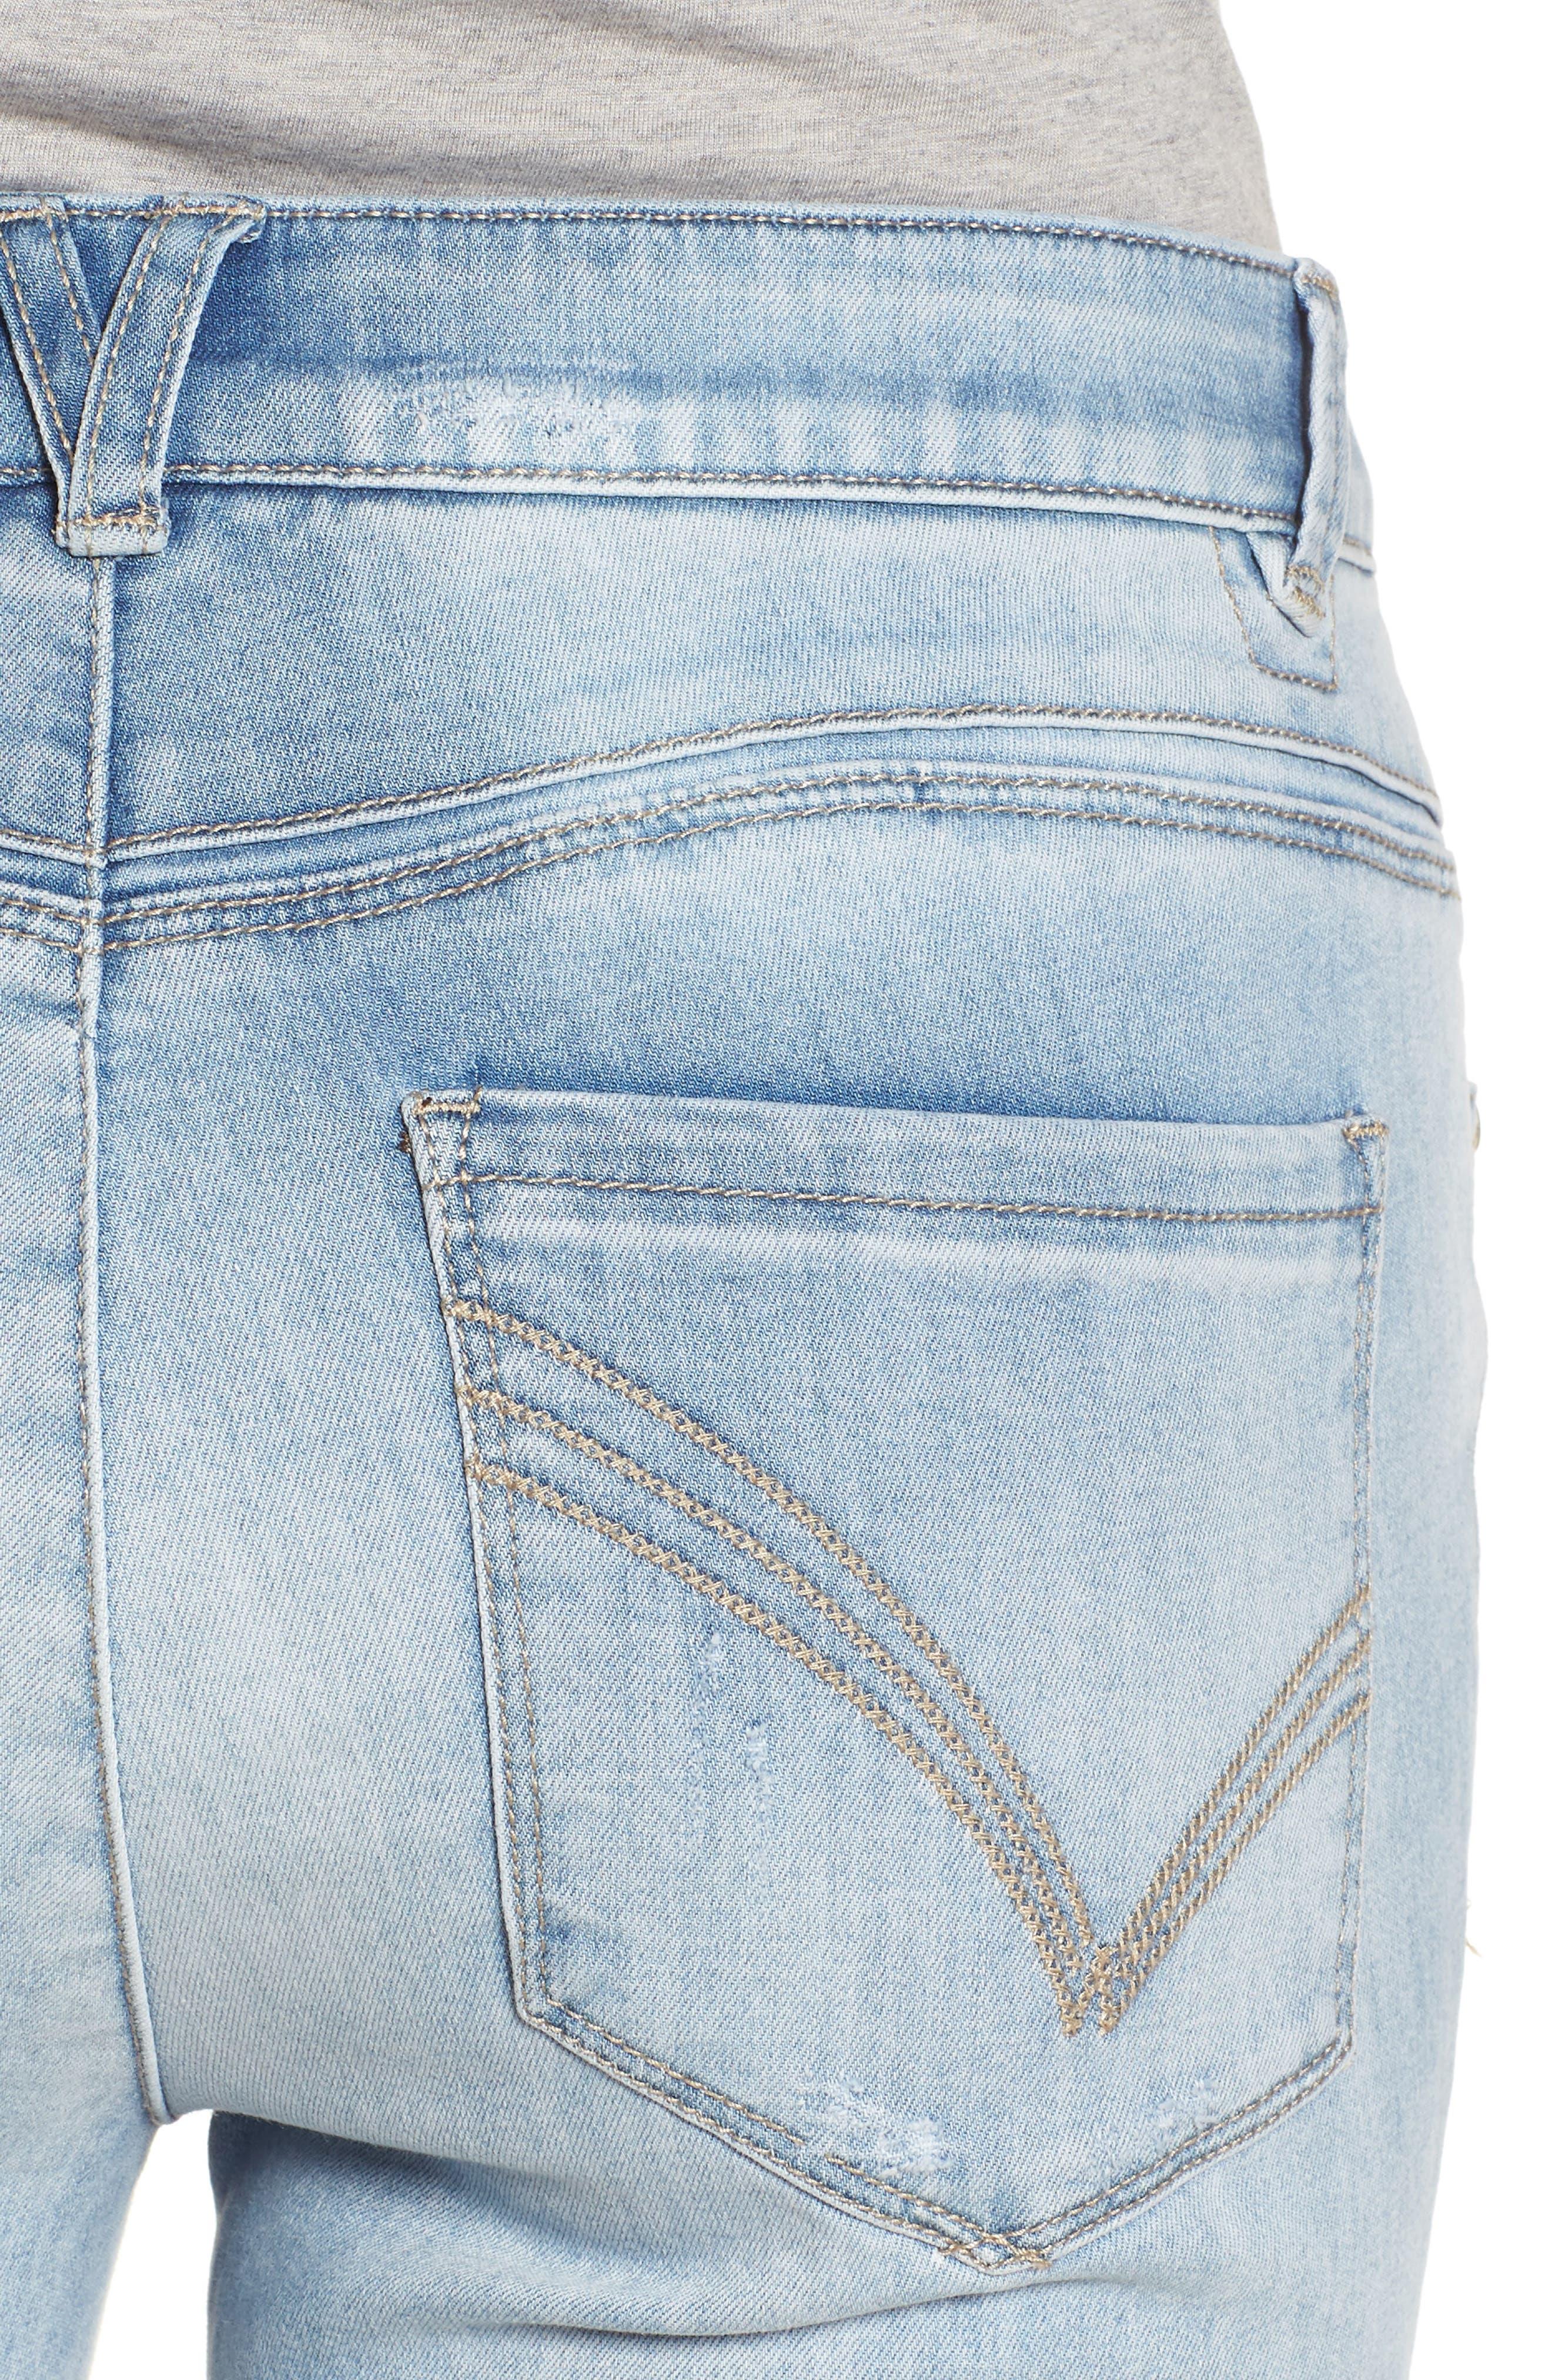 Ab-solution High Rise Crop Jeans,                             Alternate thumbnail 4, color,                             Light Blue